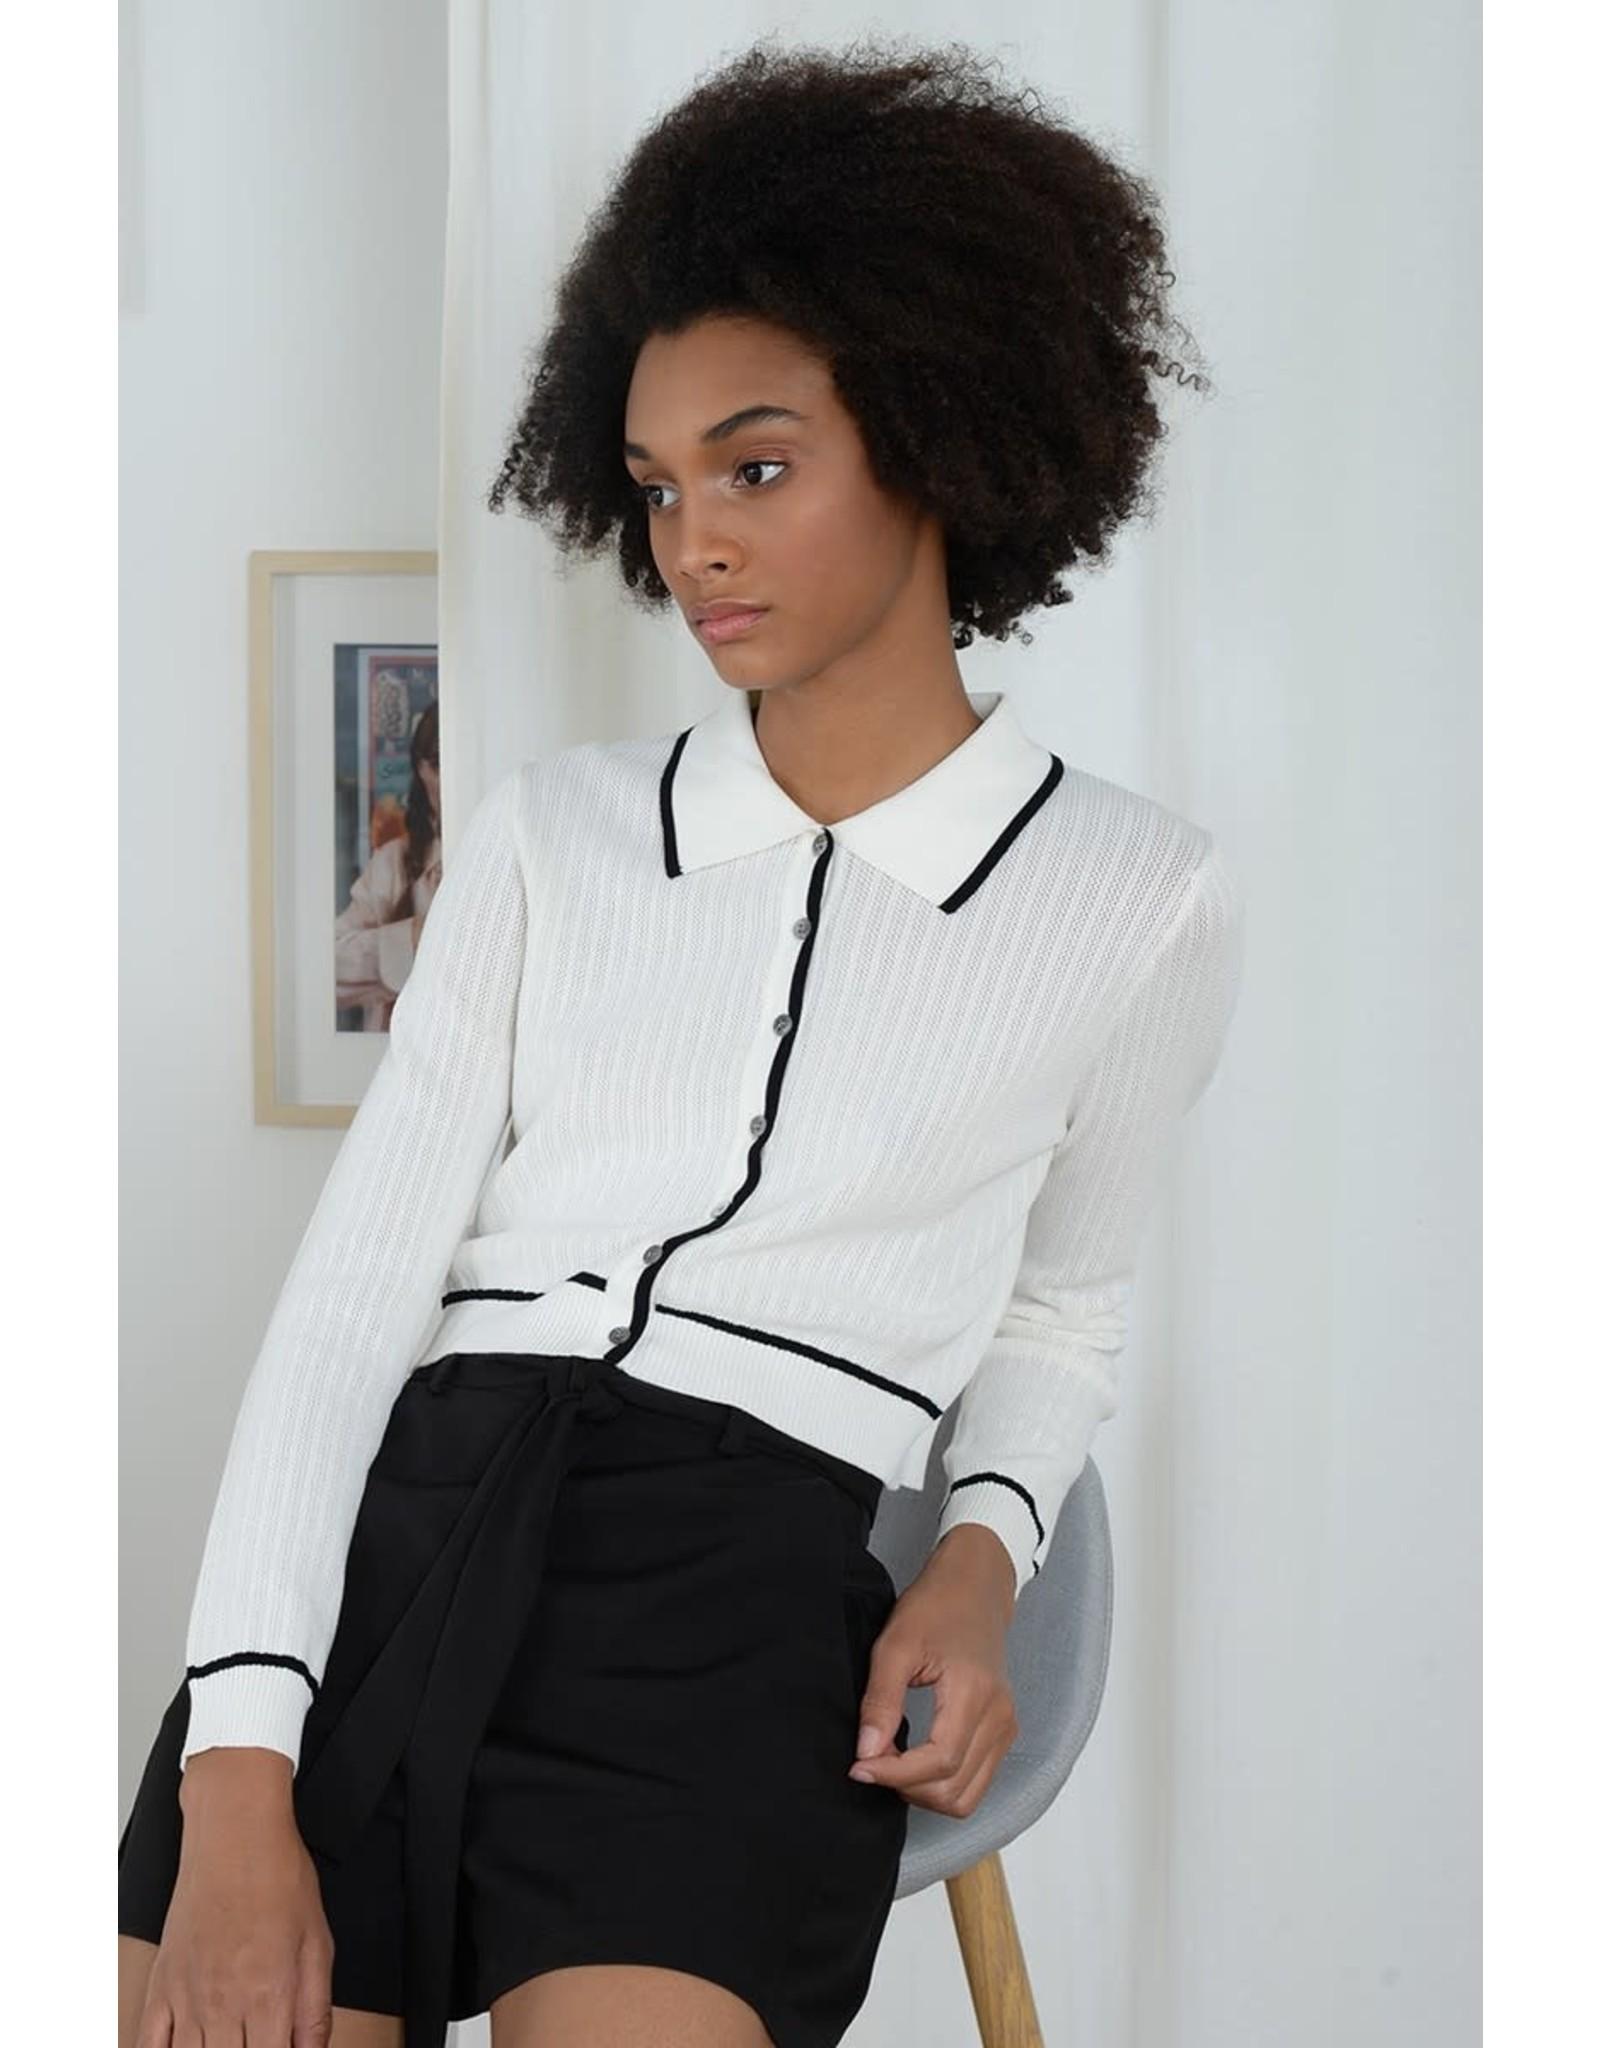 MLY - St. Germain Sweater